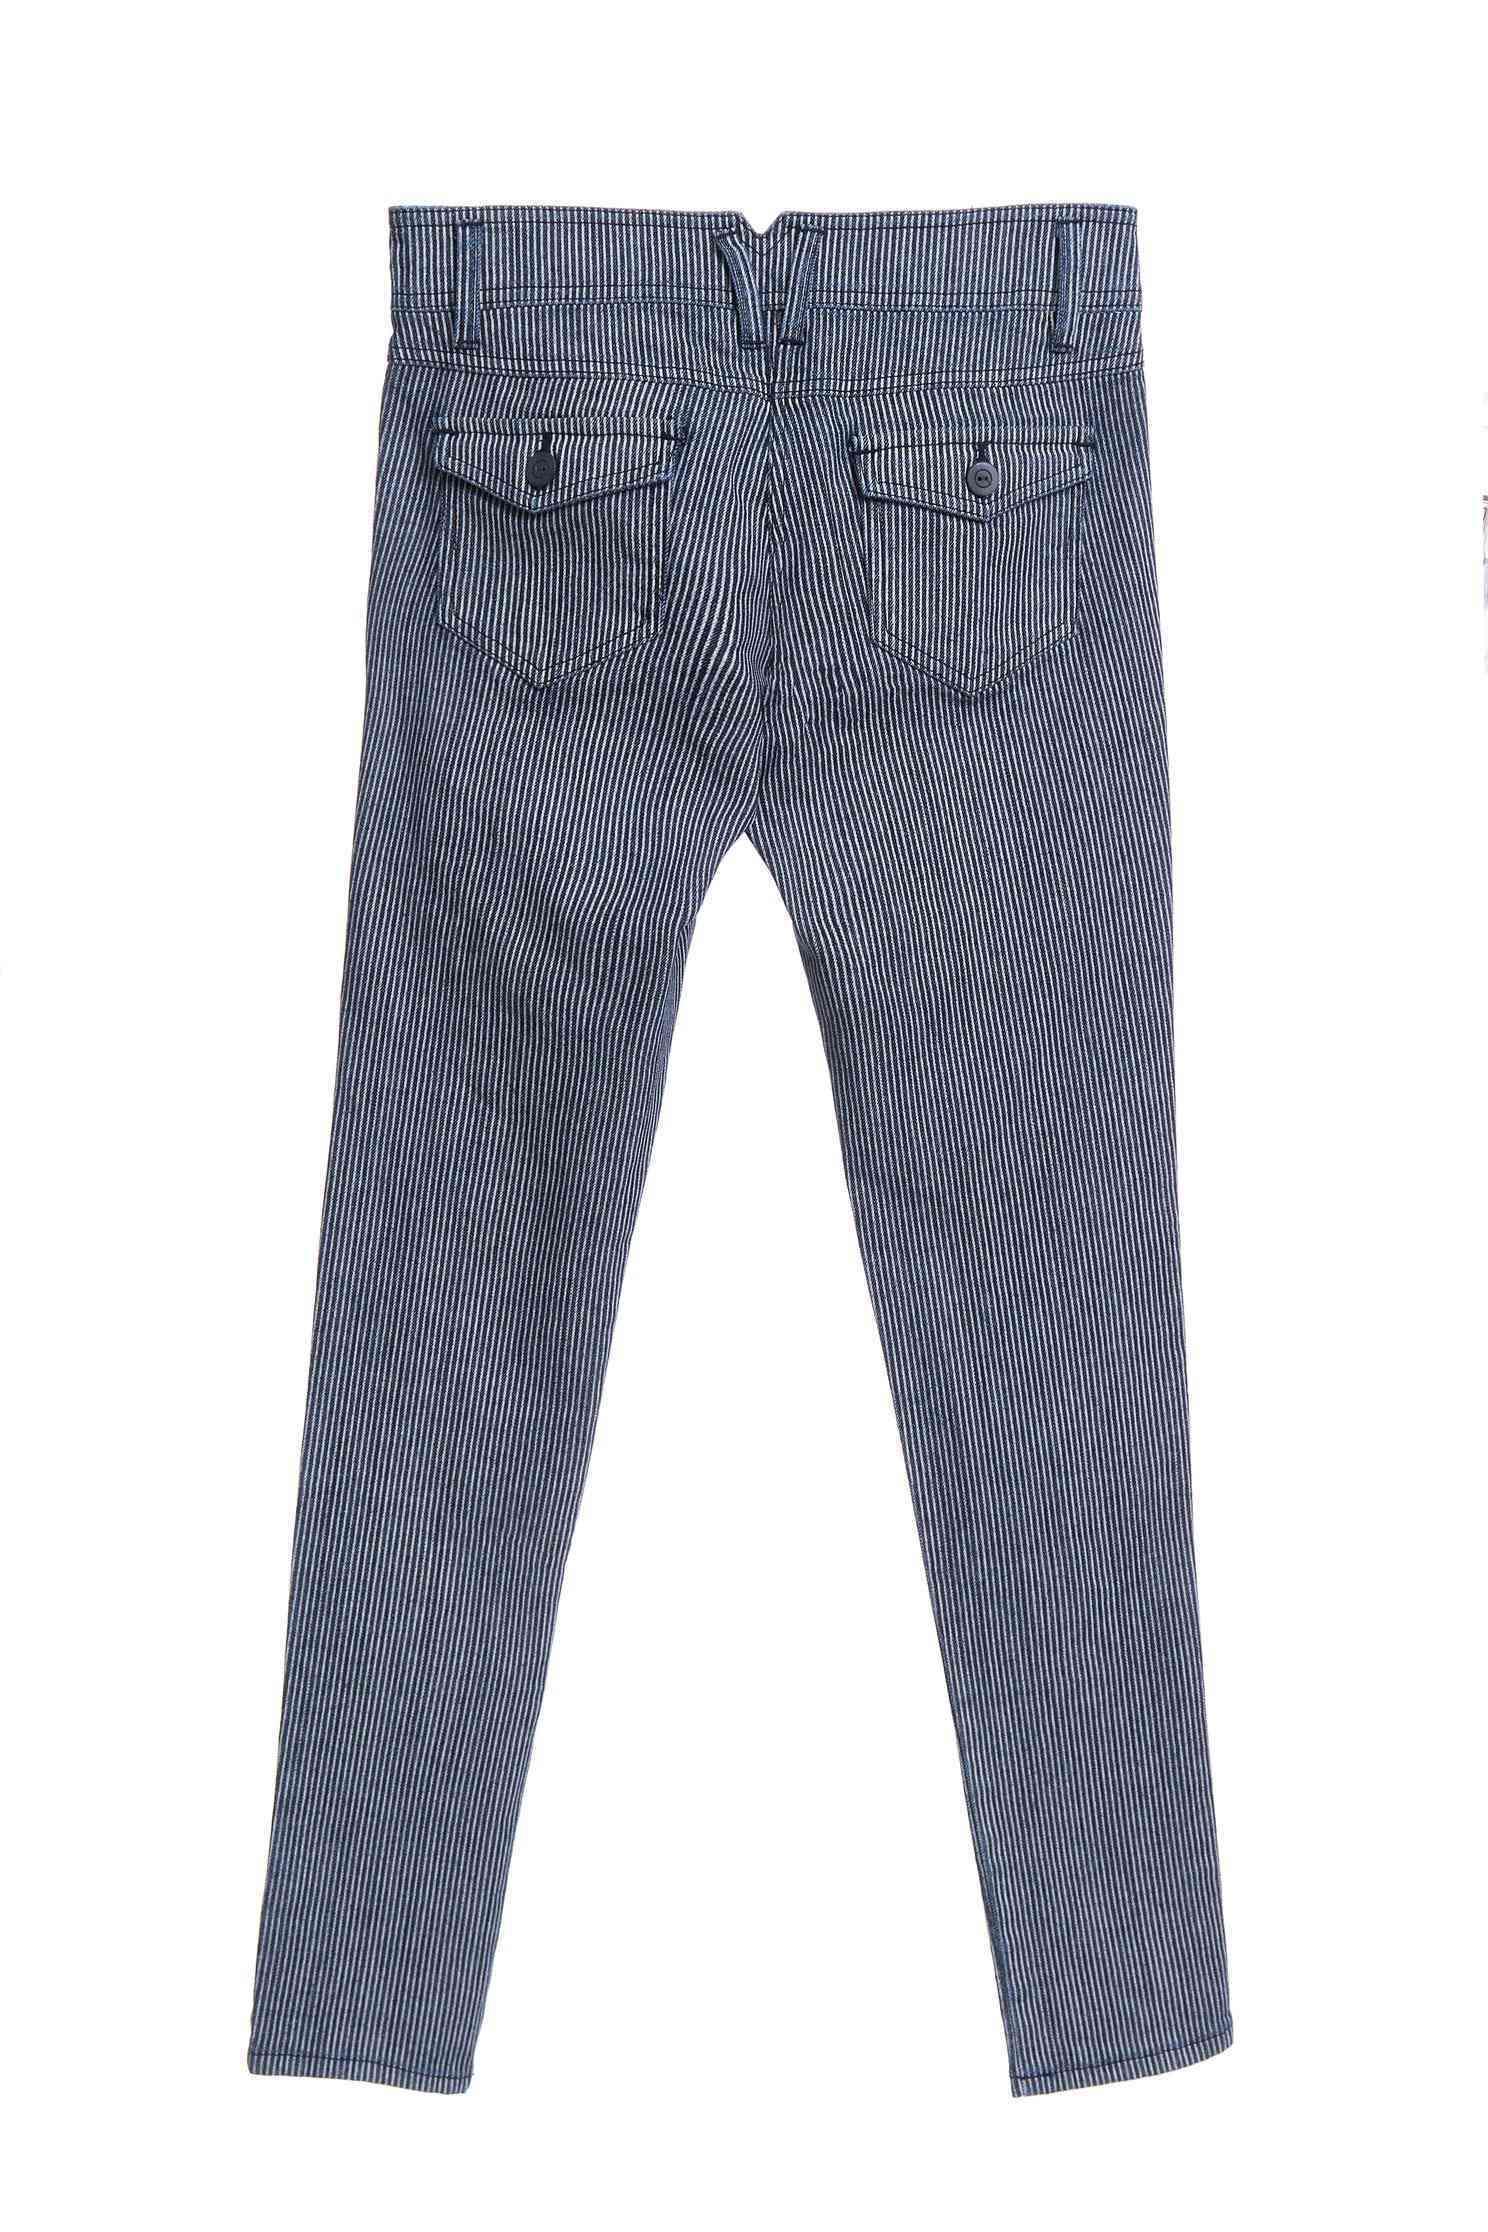 Striped denim trousers,tanning,cowboy,jeans,sdenimtrousers,skinnypants,pants,pants